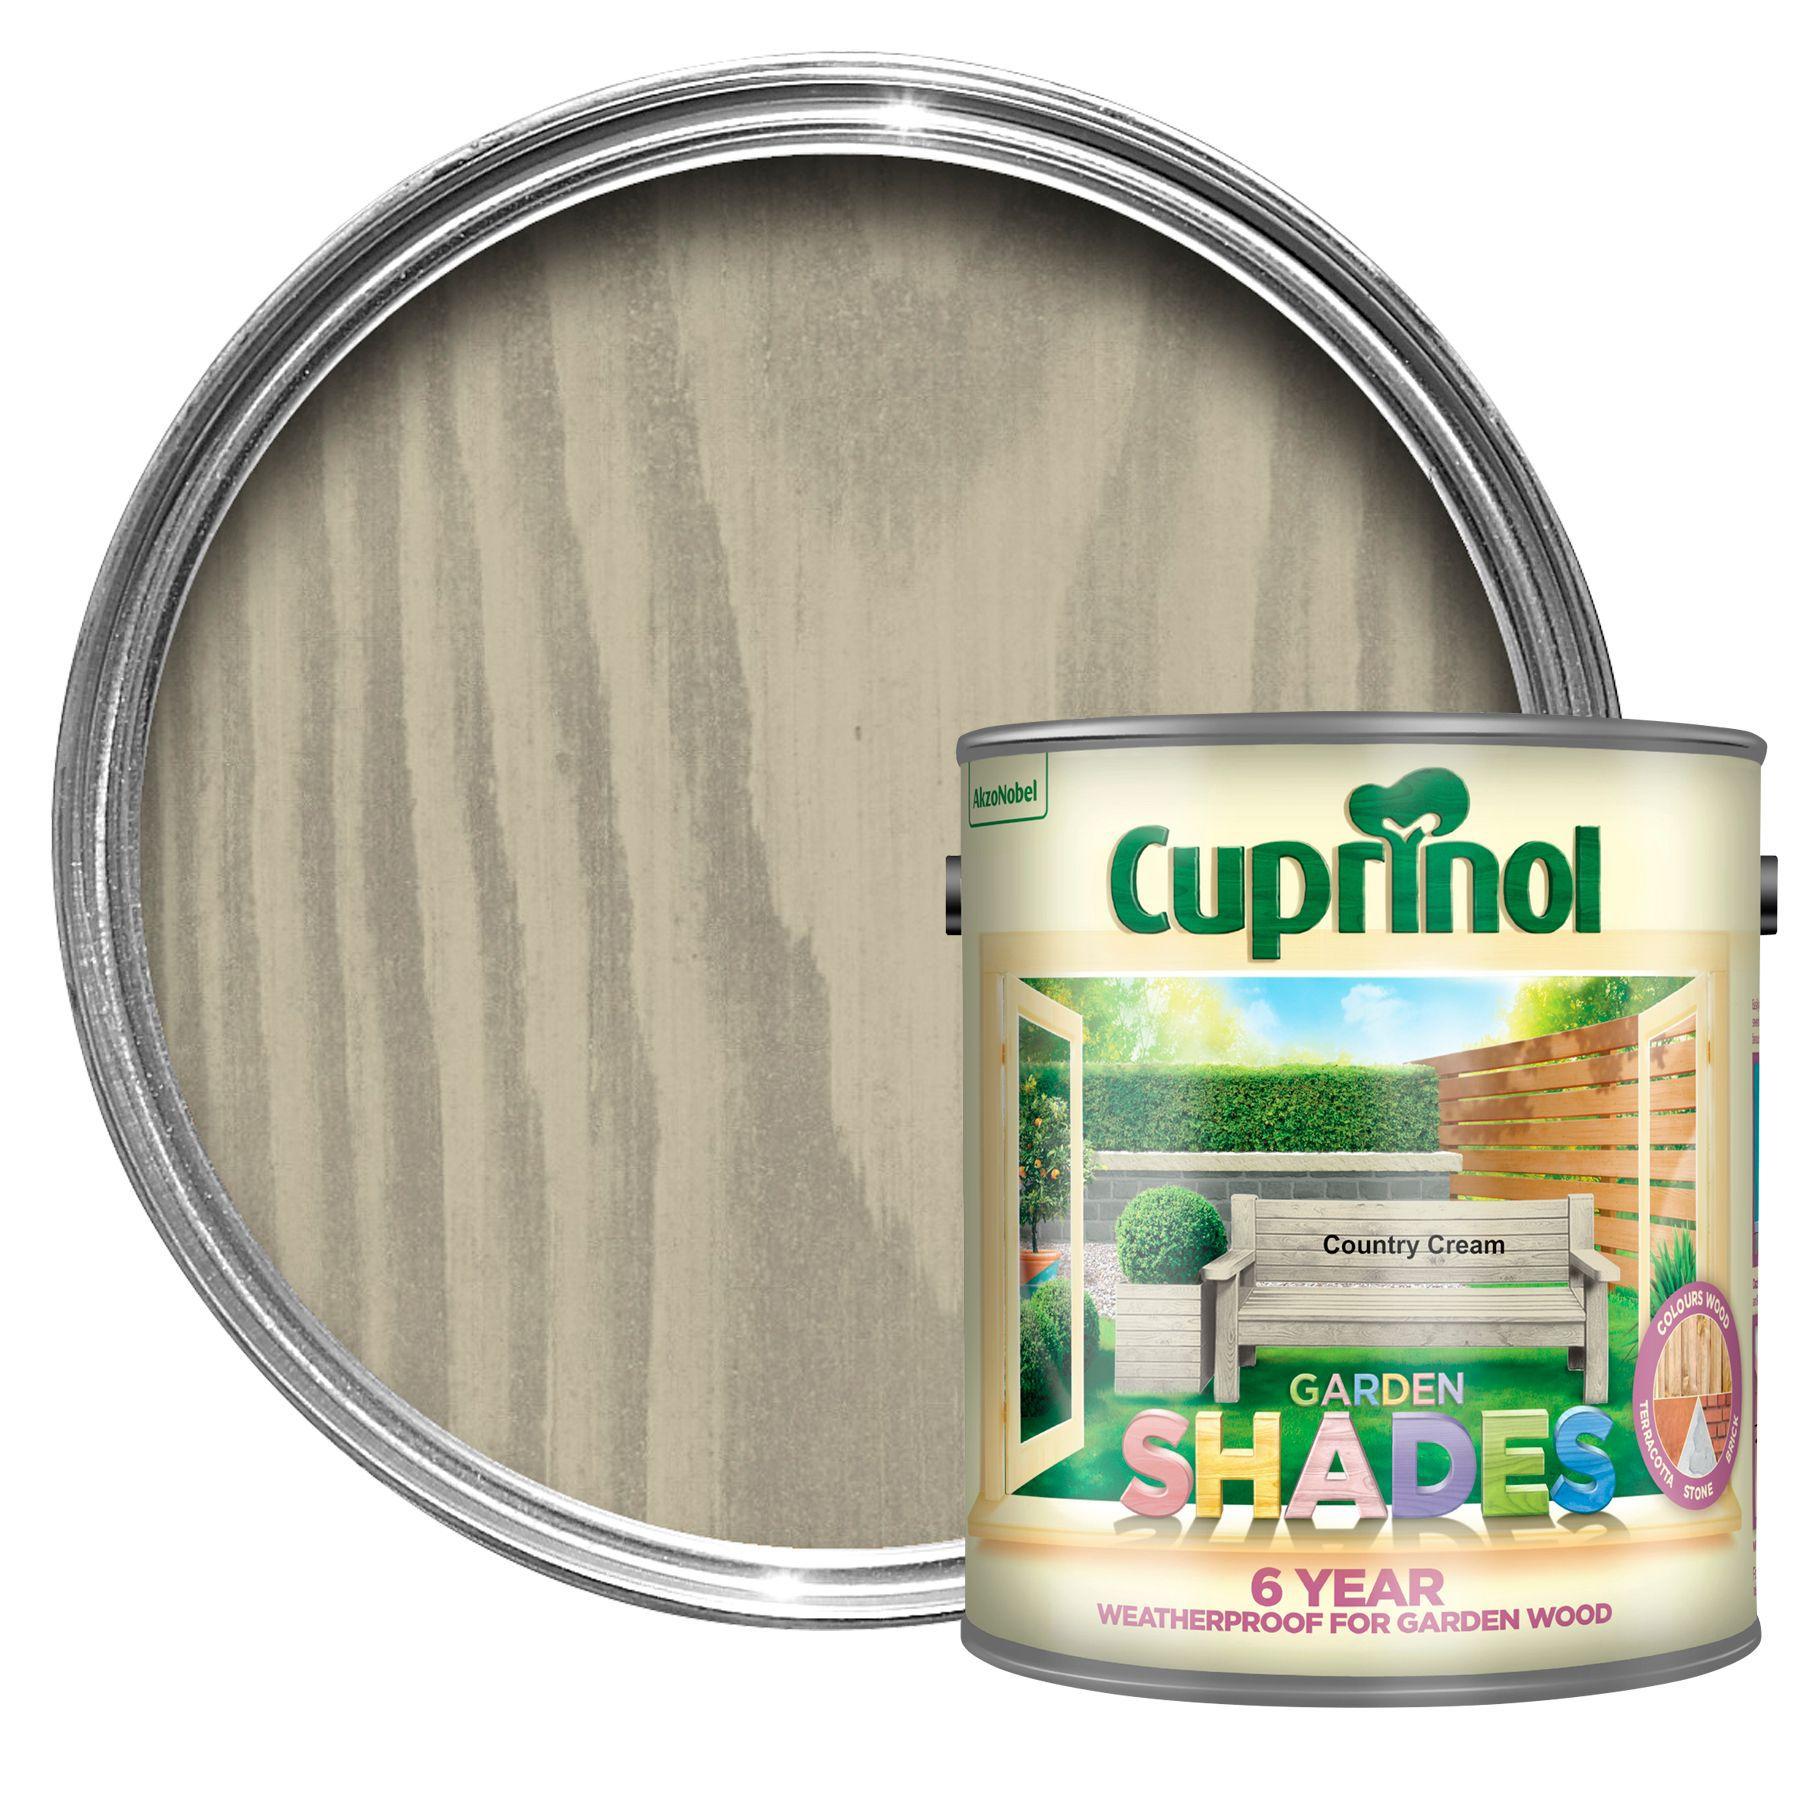 Cuprinol Garden Shades Country Cream Matt Wood Paint 2.5l